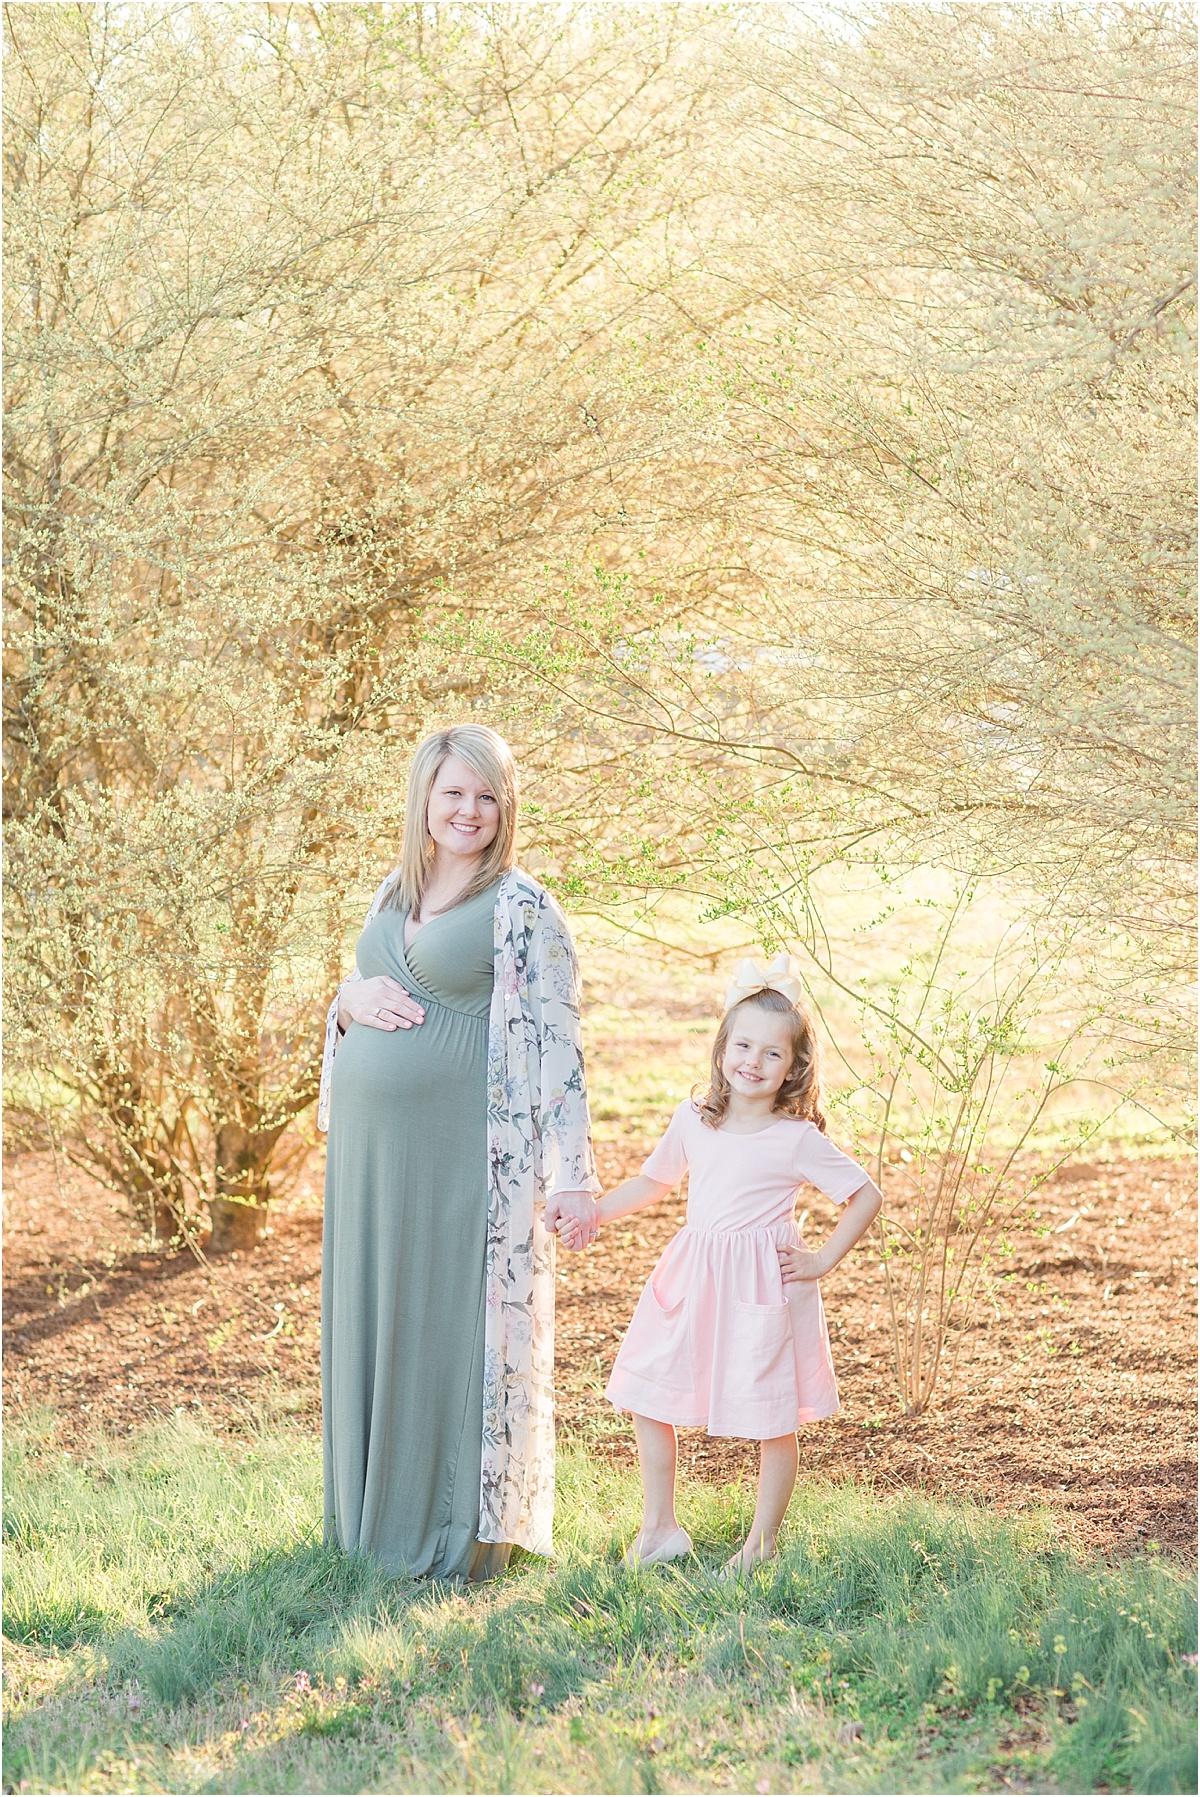 social_circle_maternity_photographers_0019.jpg